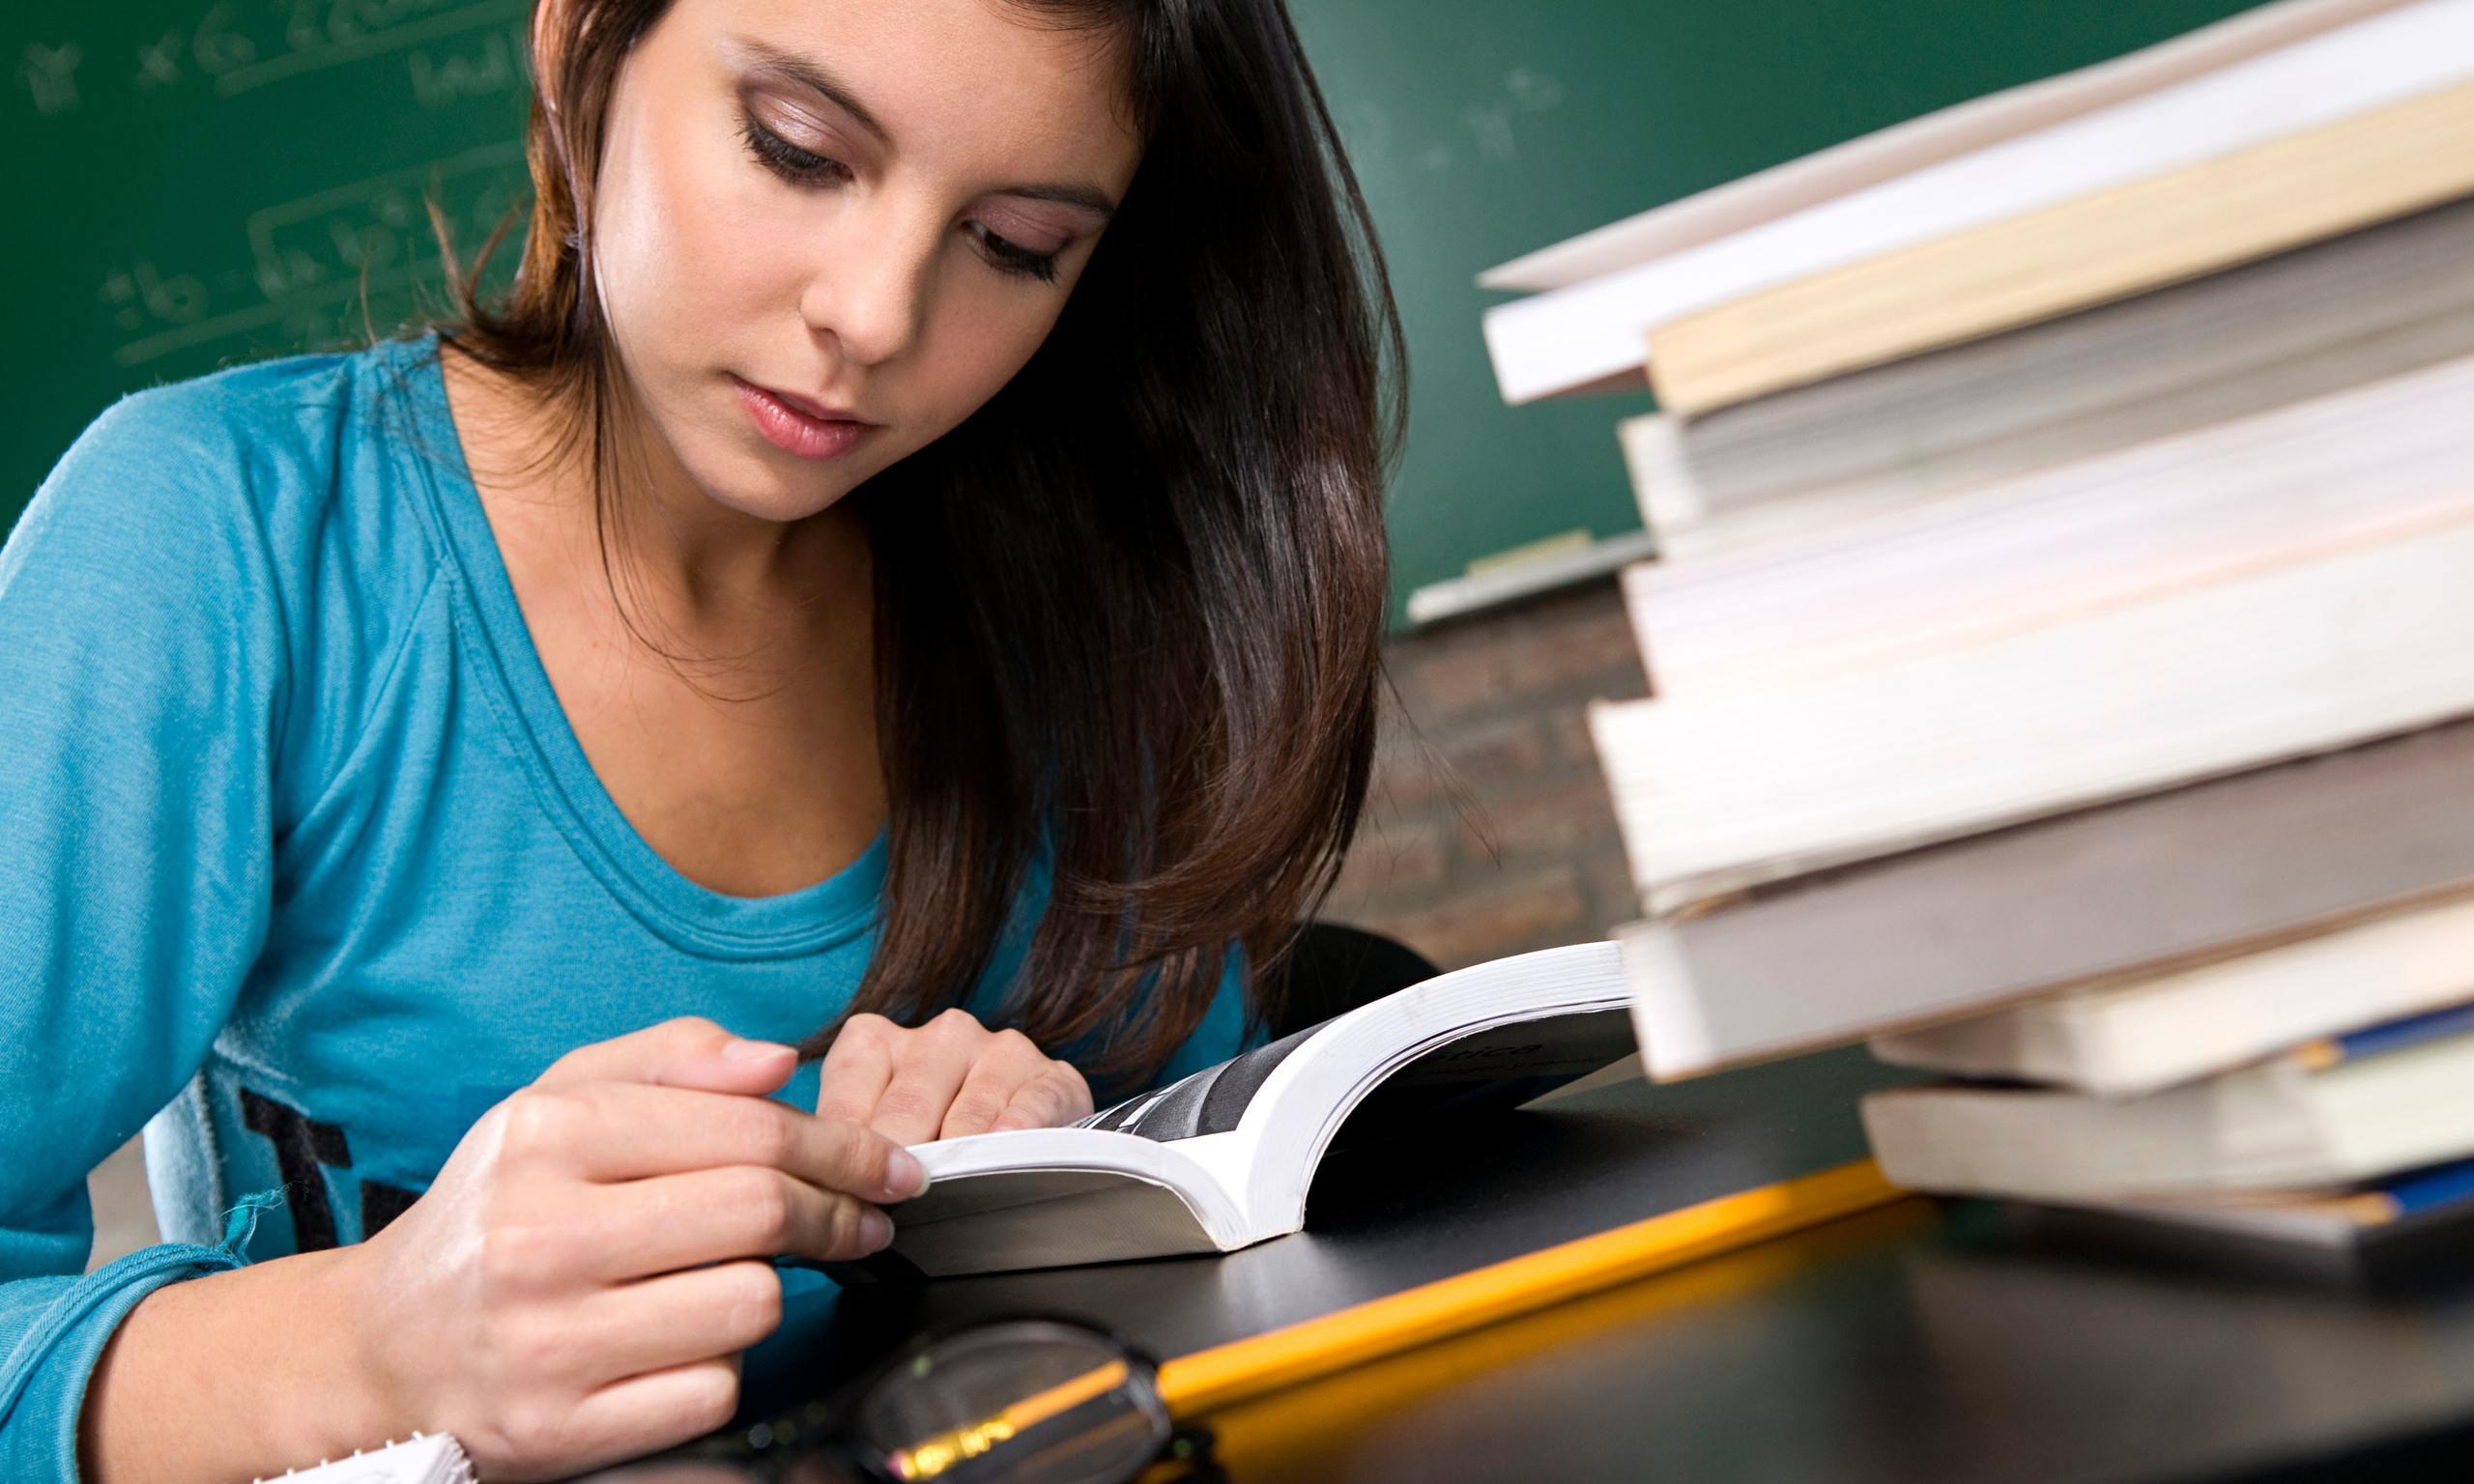 Female student studying 014 - شابک و فیپای کتاب چیست ؟ | کاربرد شابک کتاب | خدمات چاپ کتاب موسسه ایزی تز